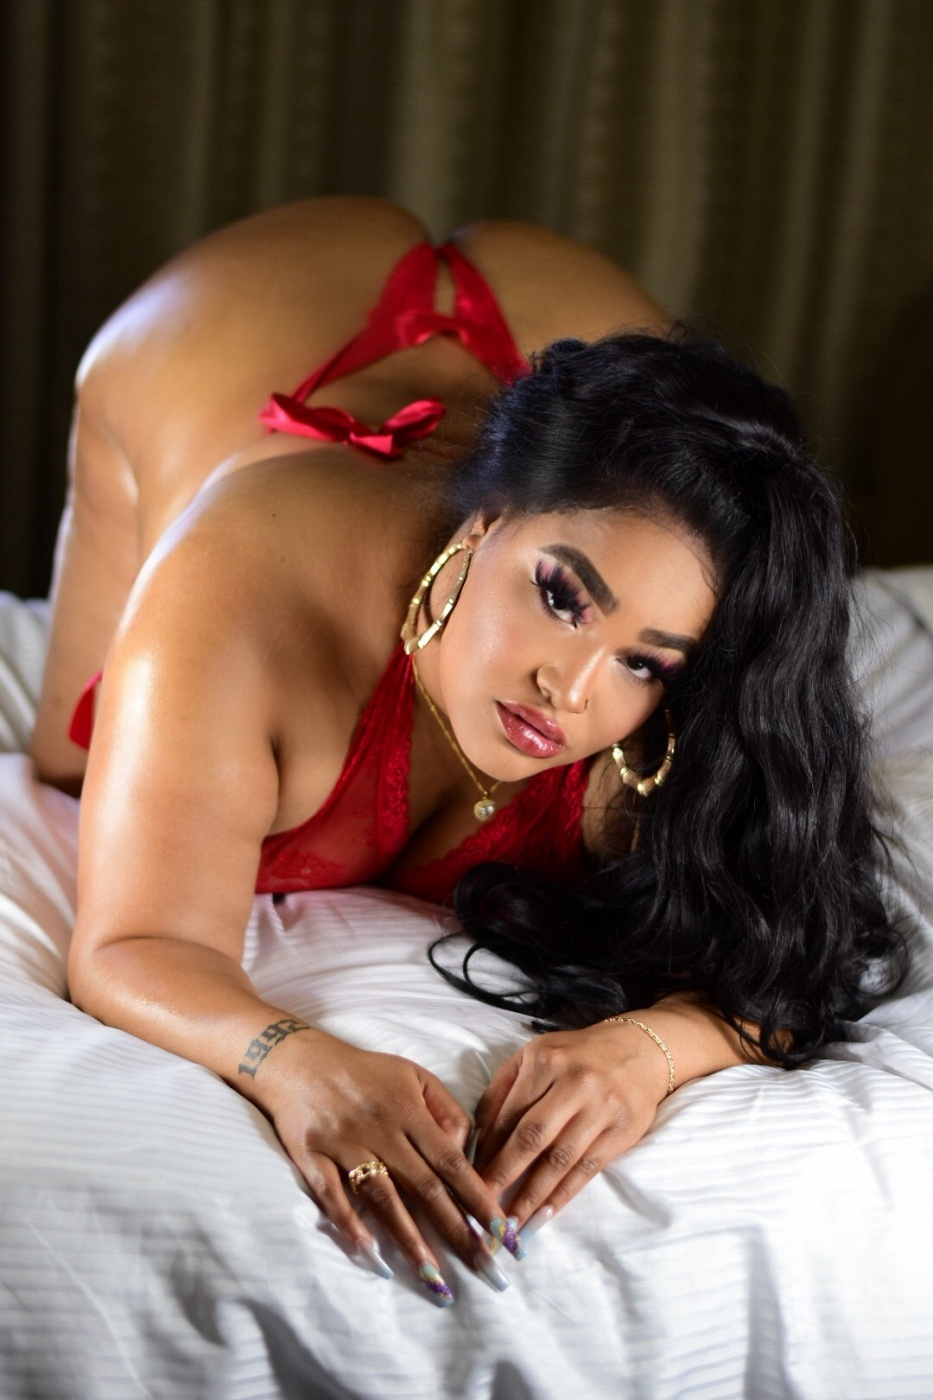 Lira Alexis